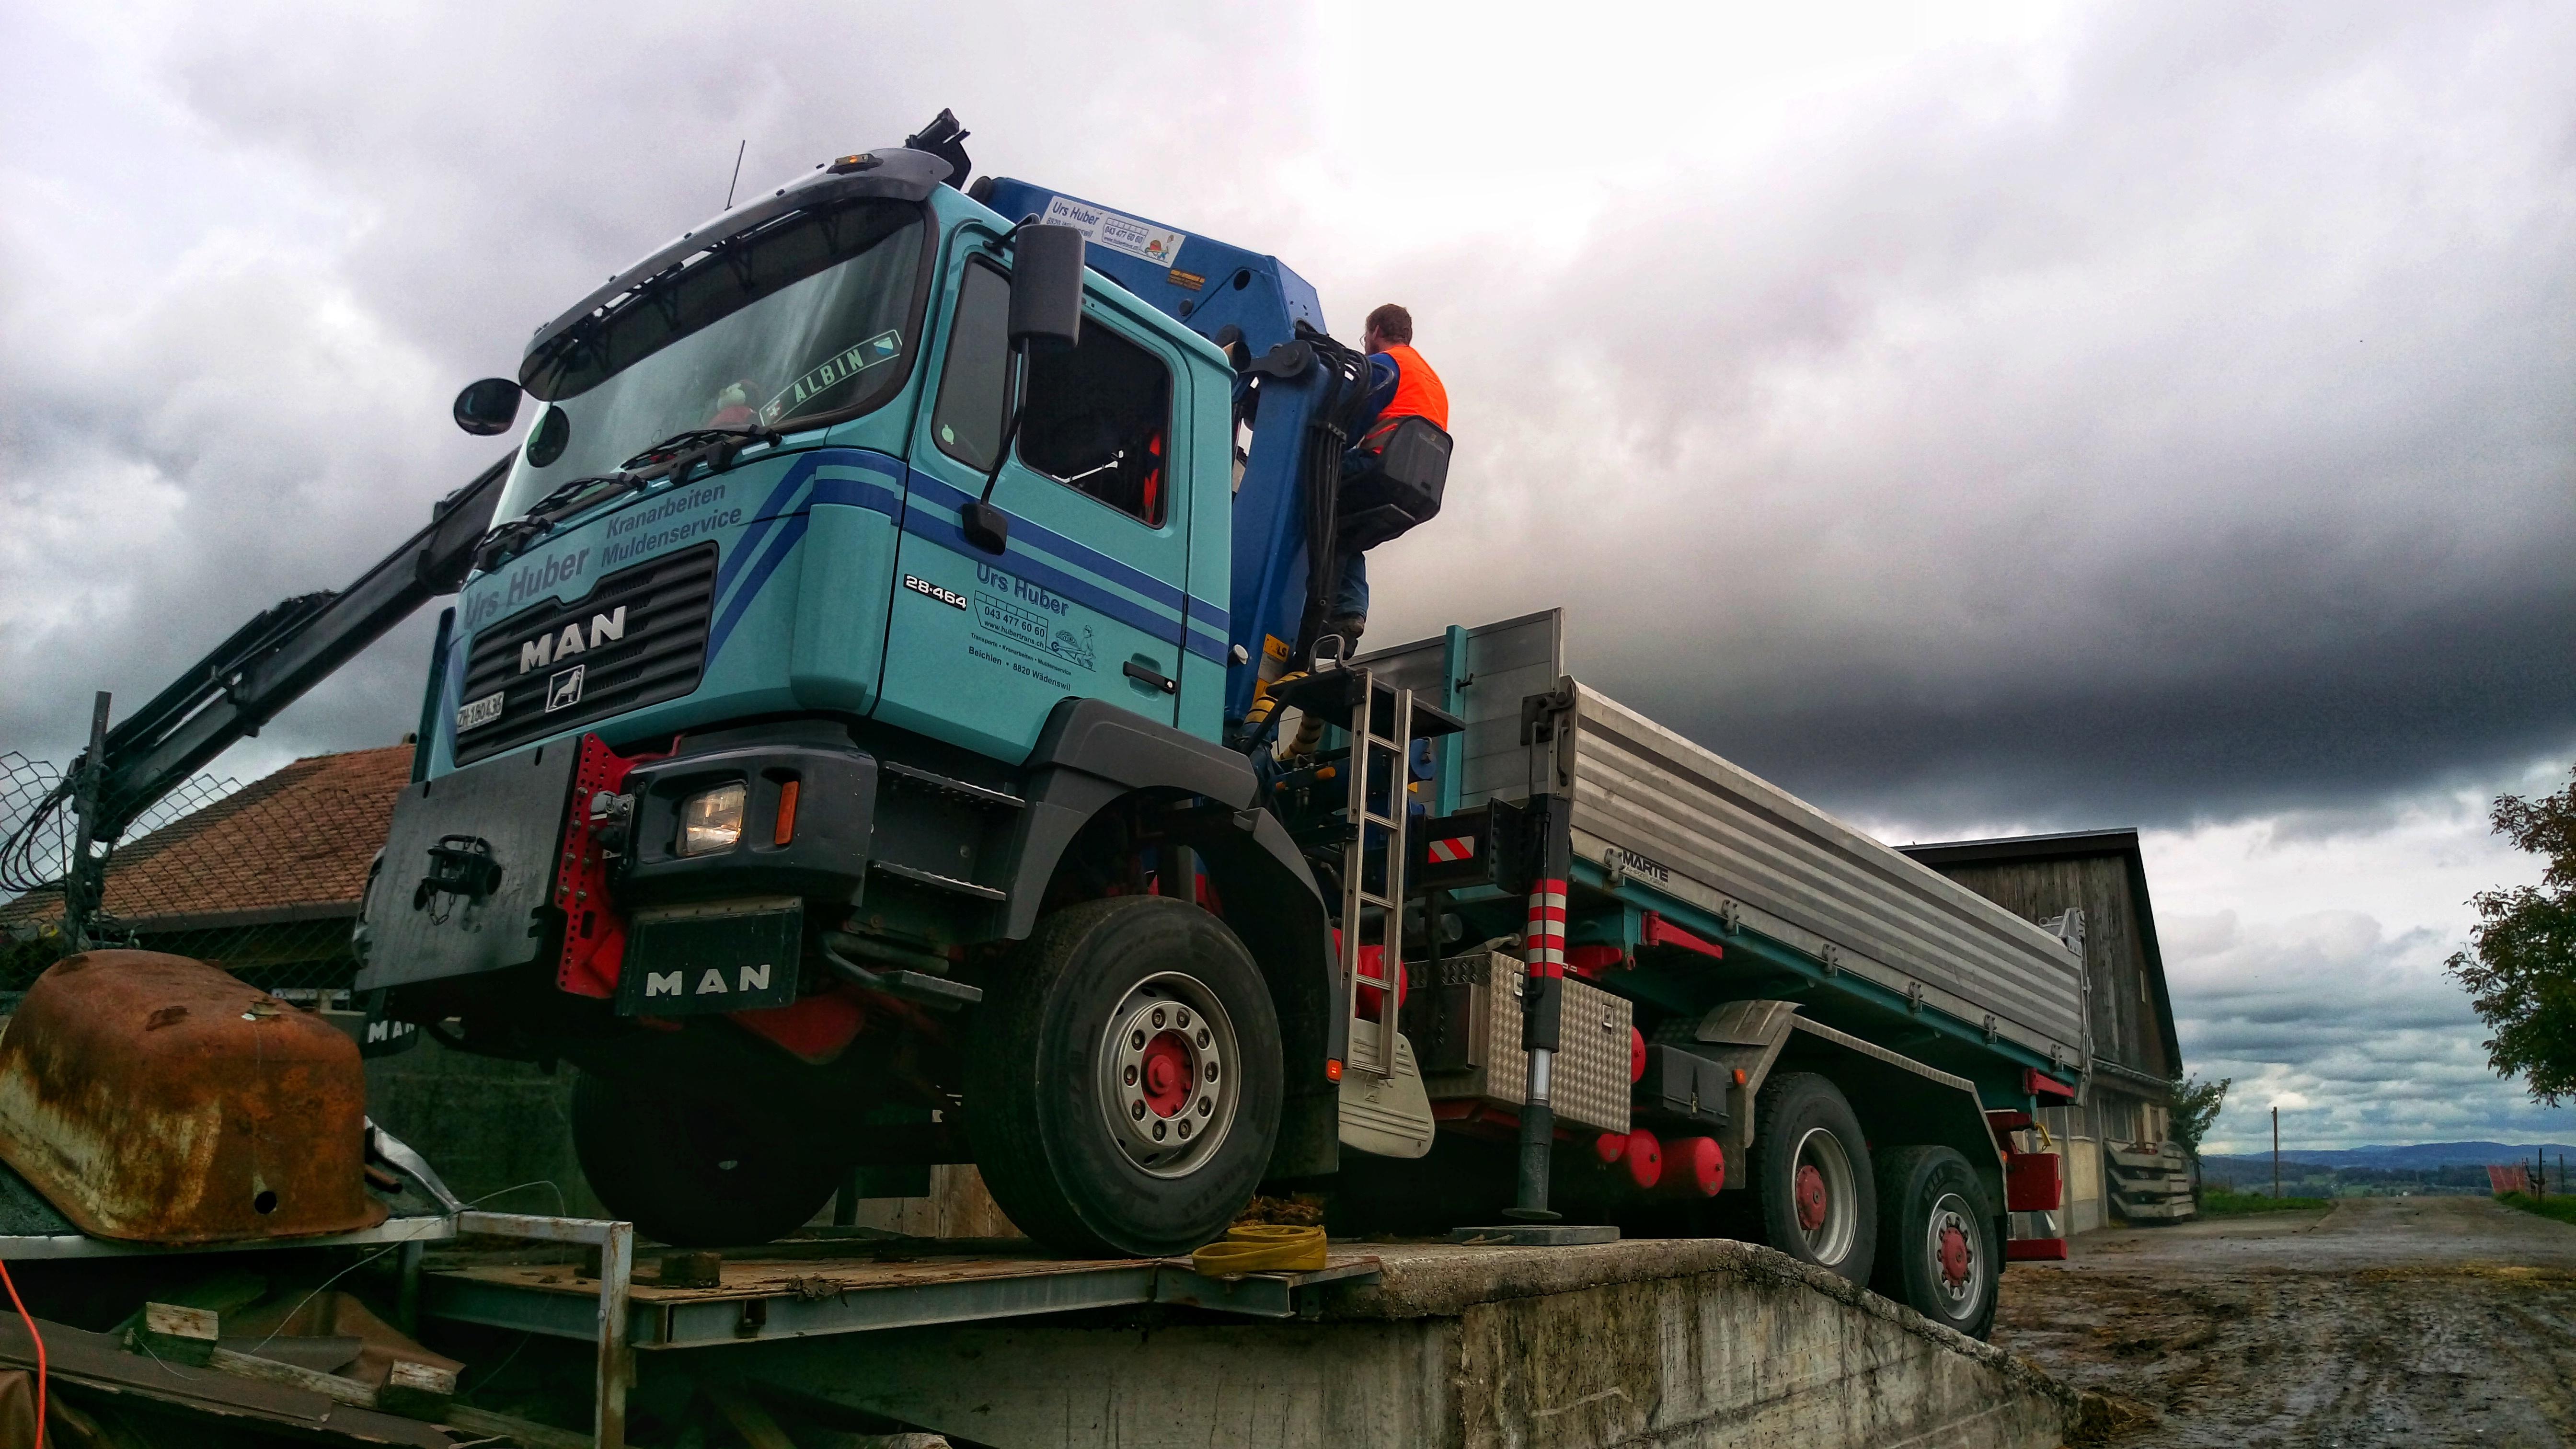 3-Achs-Kranwagen_17m_Urs_Huber_Transport[1]